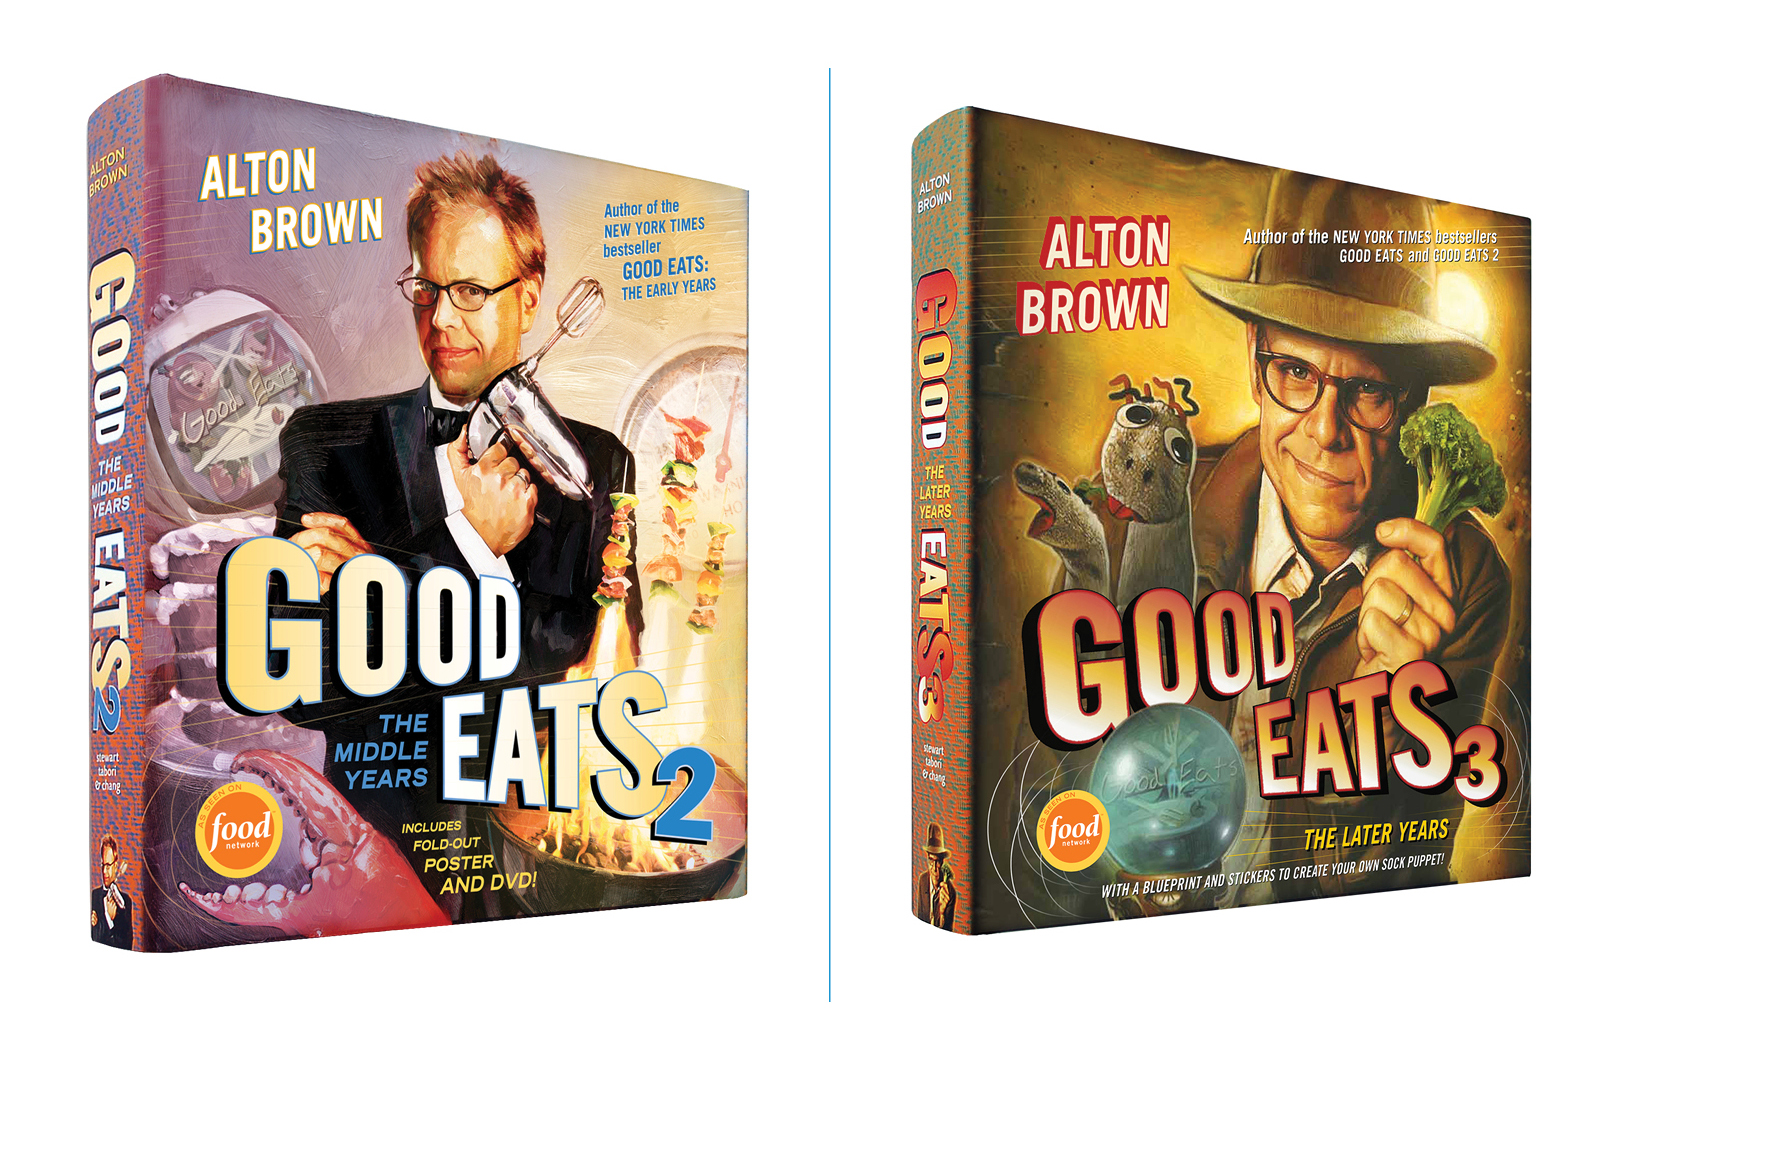 Good Eats 2, Good Eats 3 -  Design; Galen Smith, Danielle Young // Illustration; Jim Salvati, Mike Koelsch, Eric Cole // Publisher; Stewart, Tabori & Chang